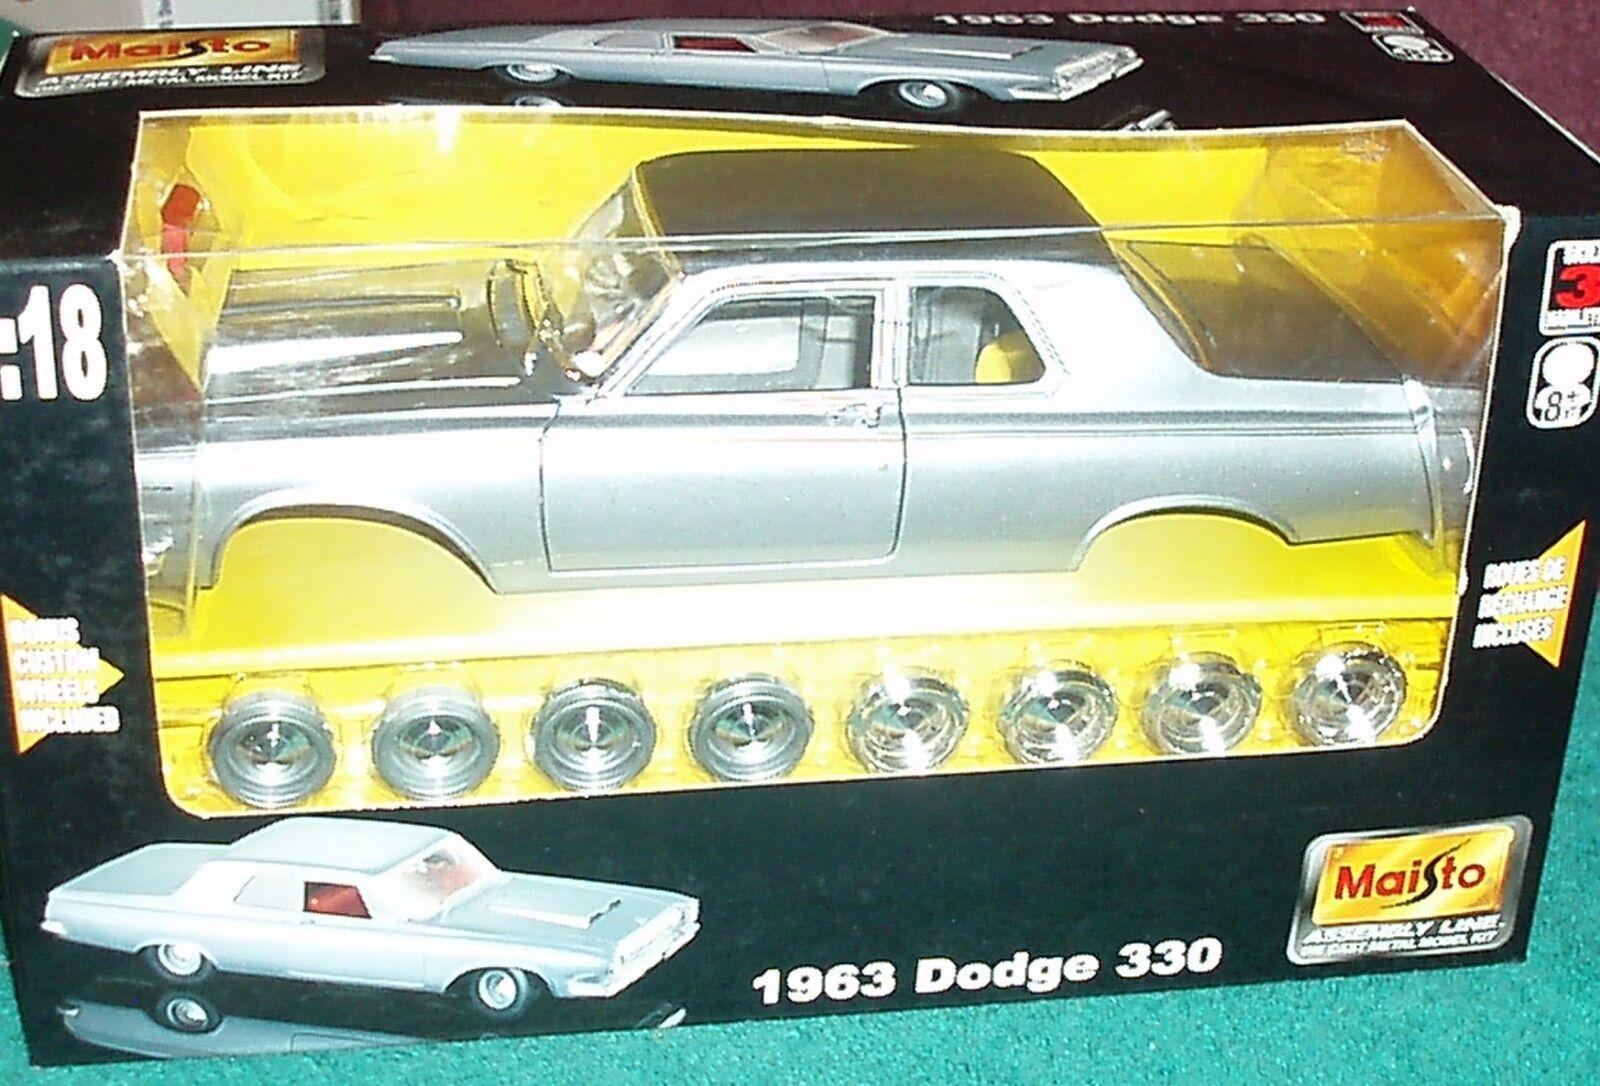 Maisto 1963 Dodge 330 Coupe Conjunto Modelo Kit 1 18 VHTF nivel de habilidad 3